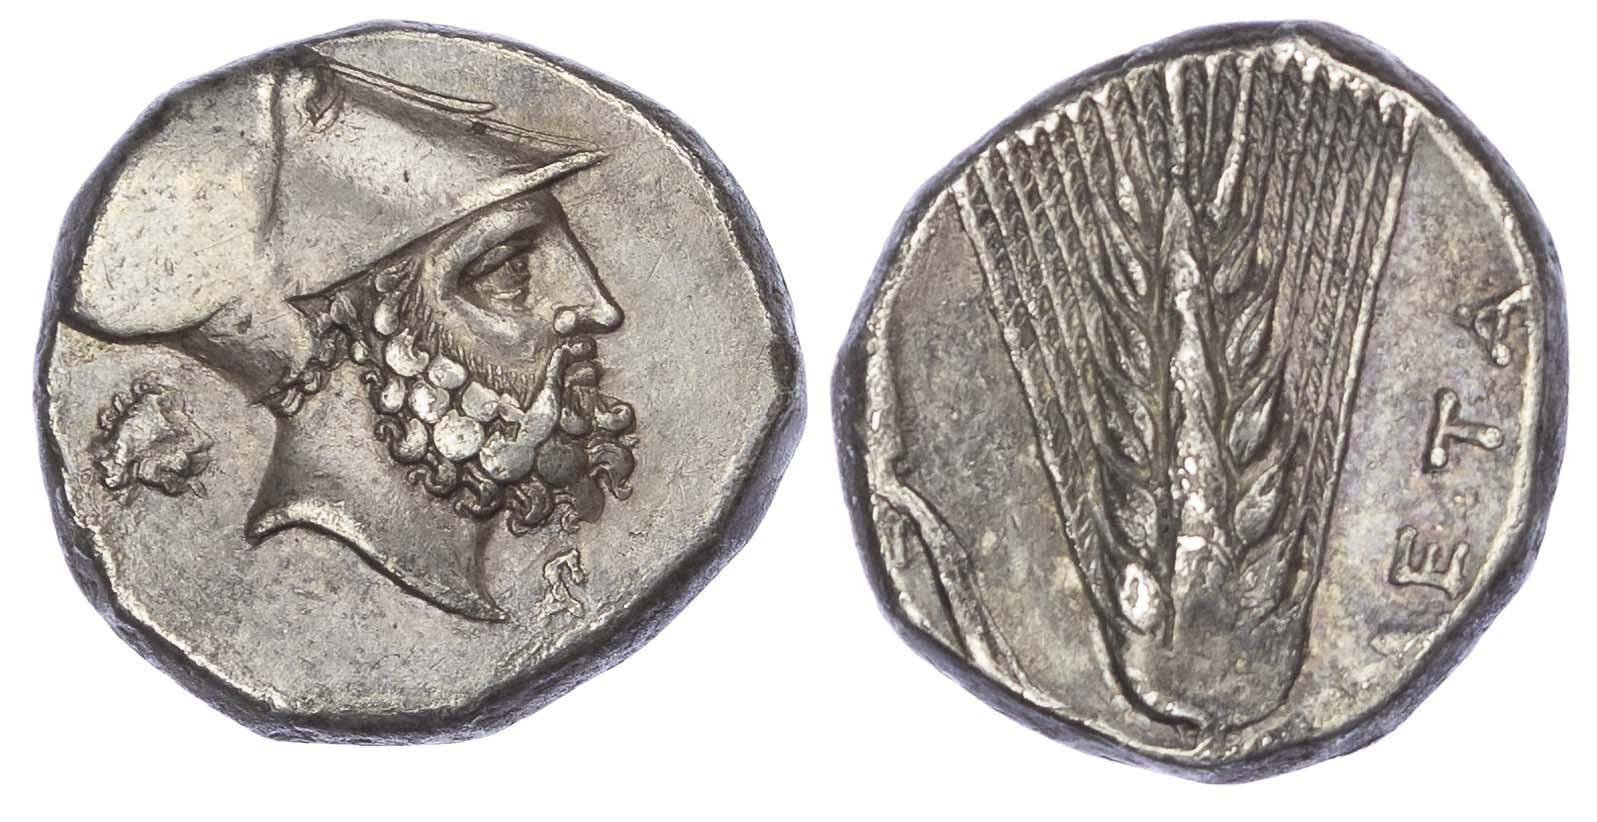 Lucania, Metapontum, Silver Nomos